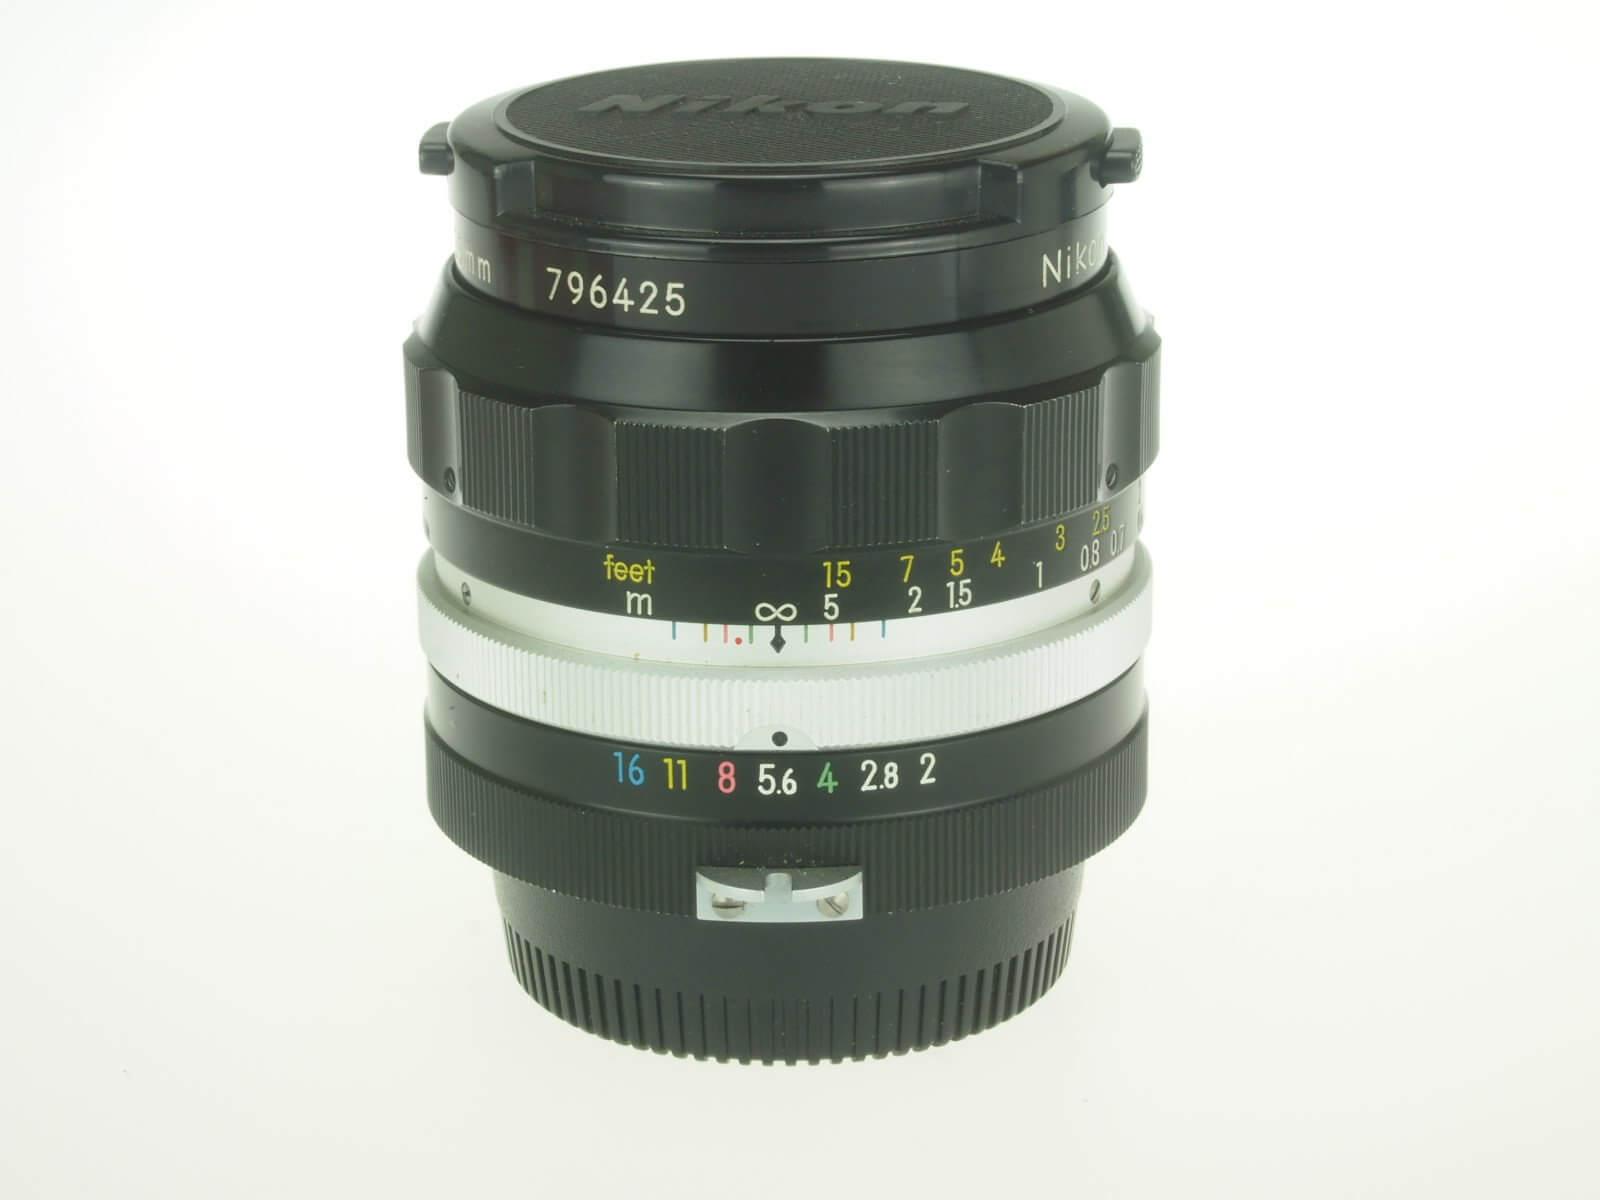 Nikon 35 f2 Nikkor, pre-AI mount, not far from mint!